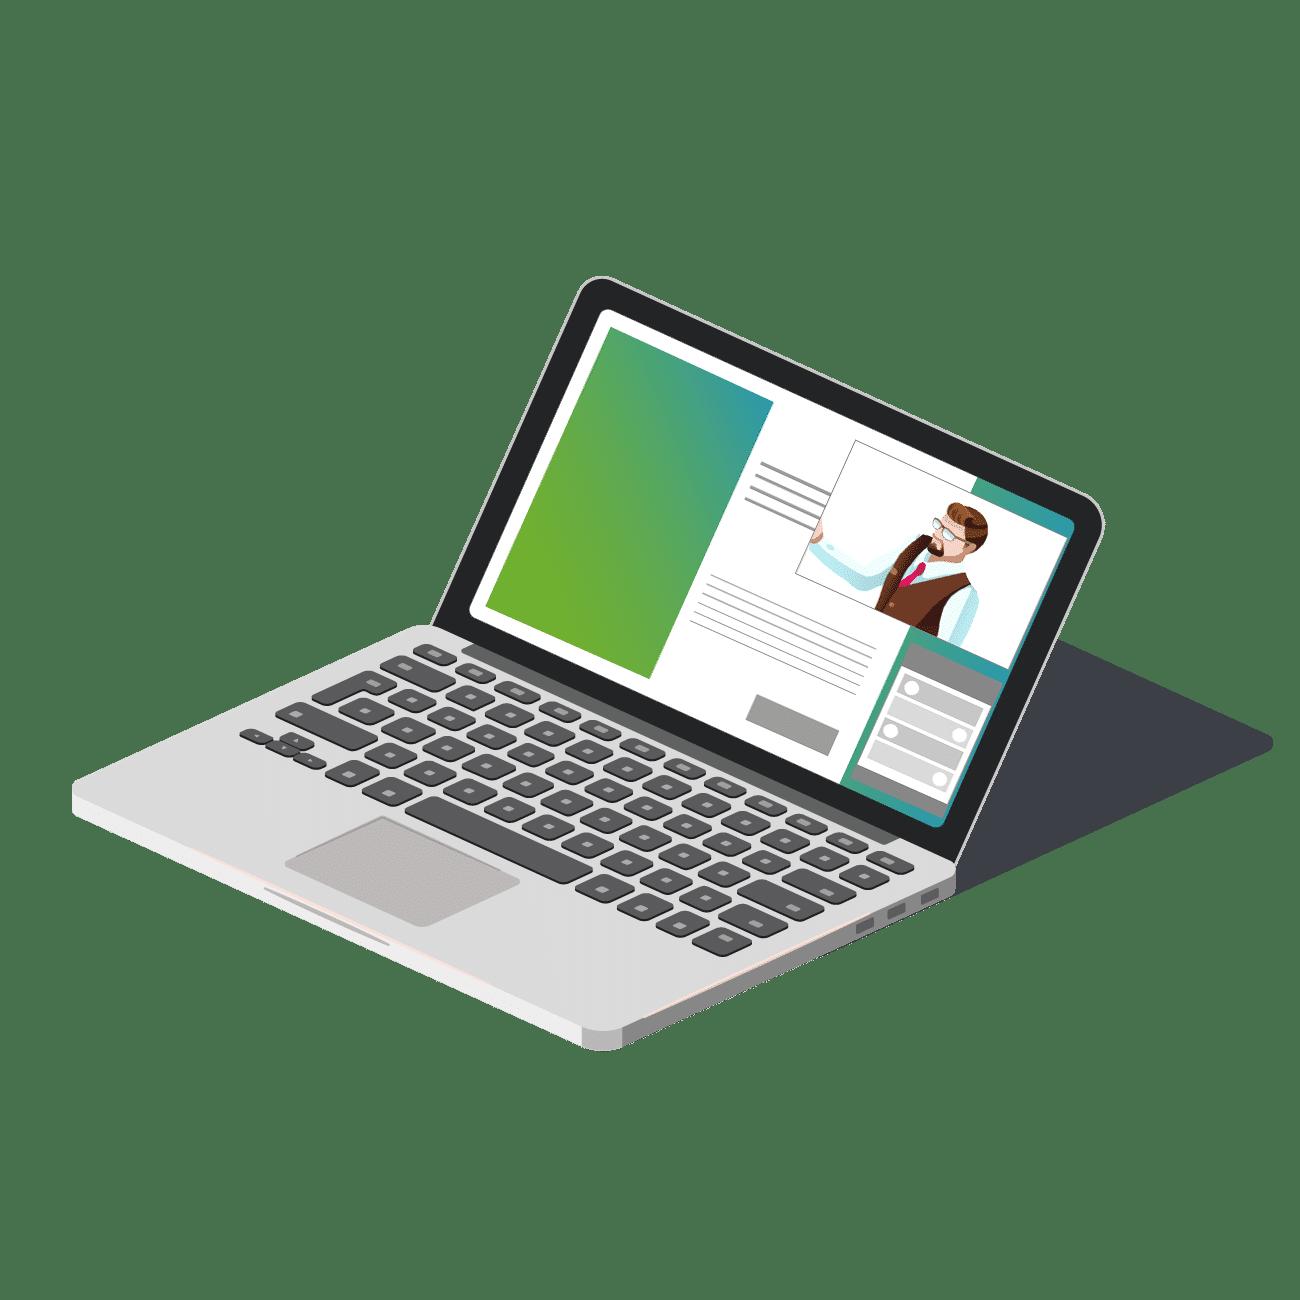 Webinar Mobility Tech Green